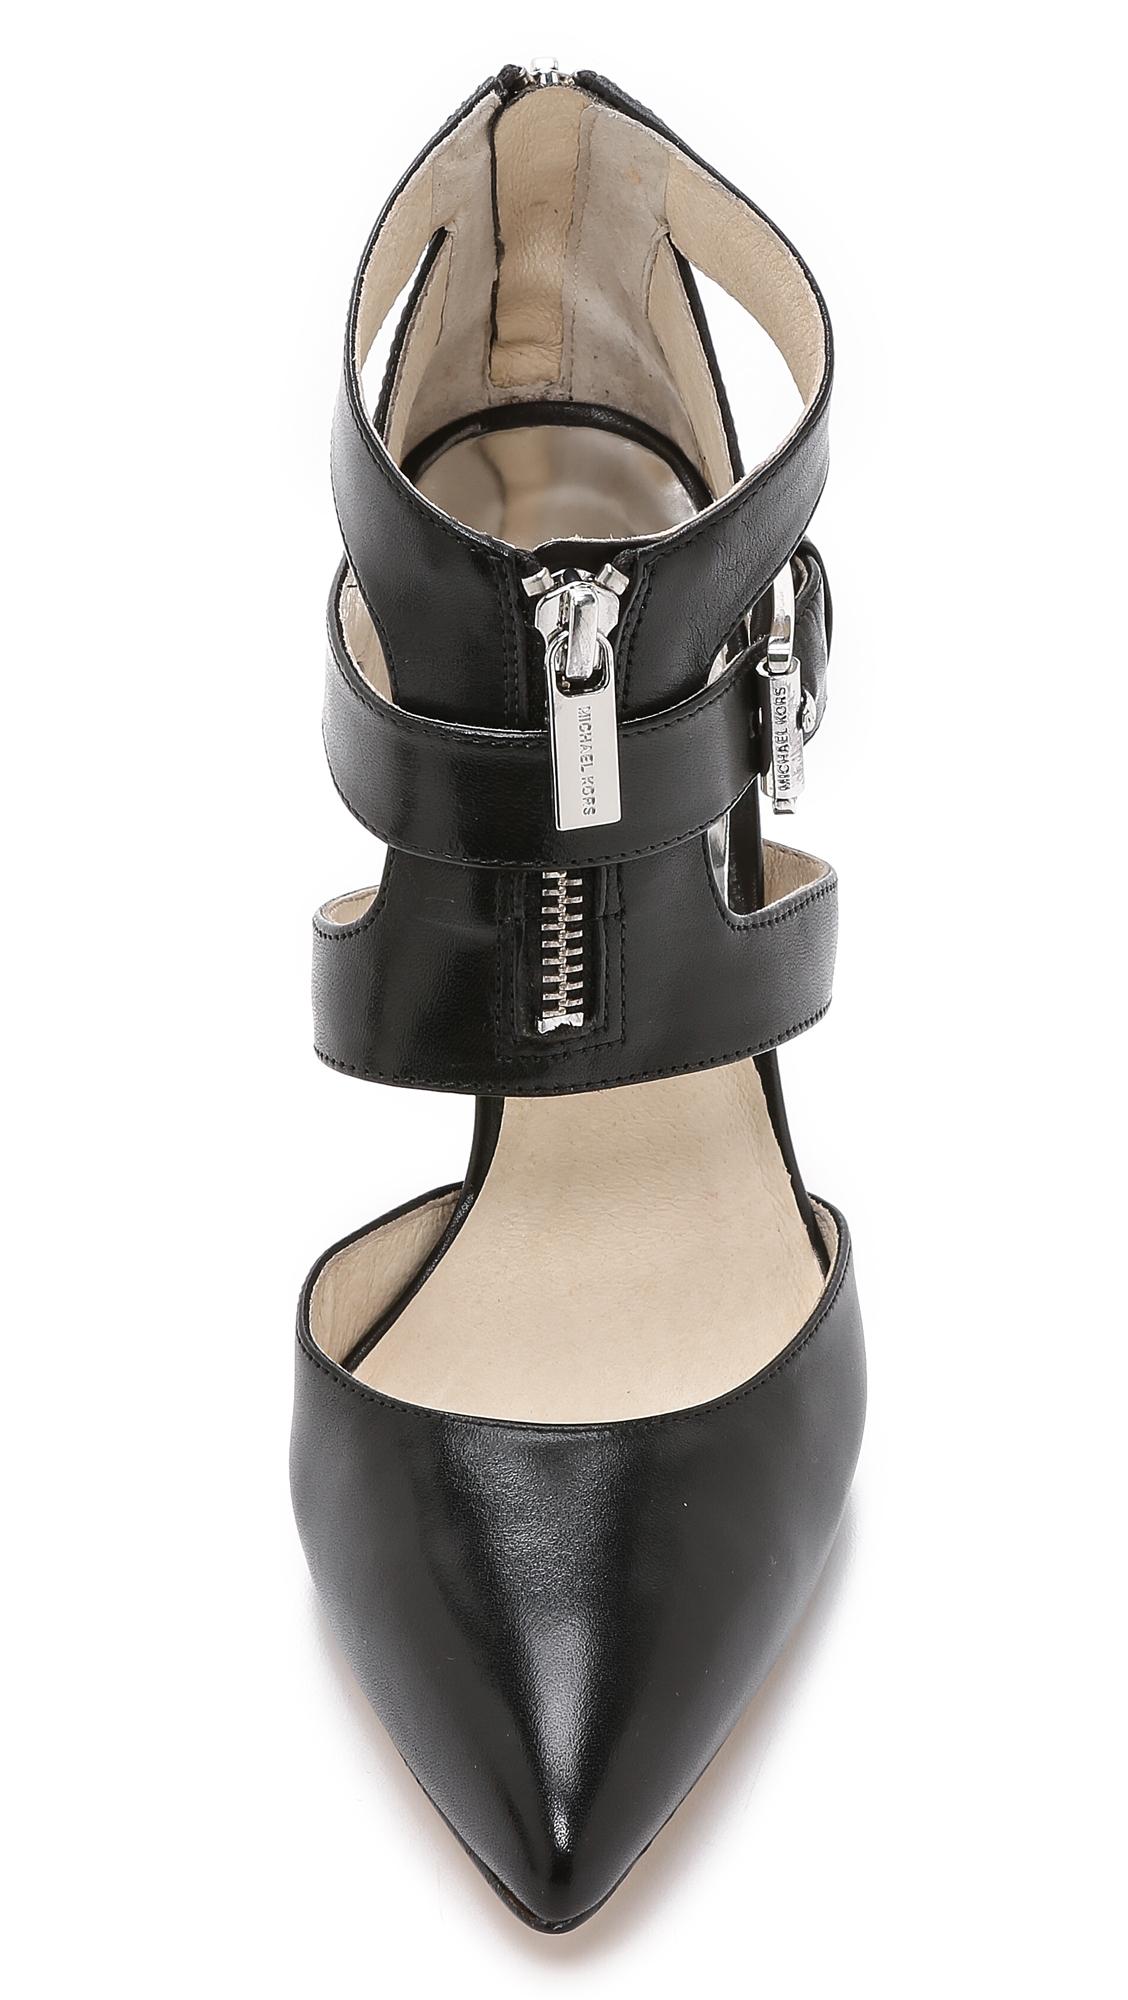 b4aee679496 MICHAEL Michael Kors Anya Back Zip Pumps - Black in Black - Lyst